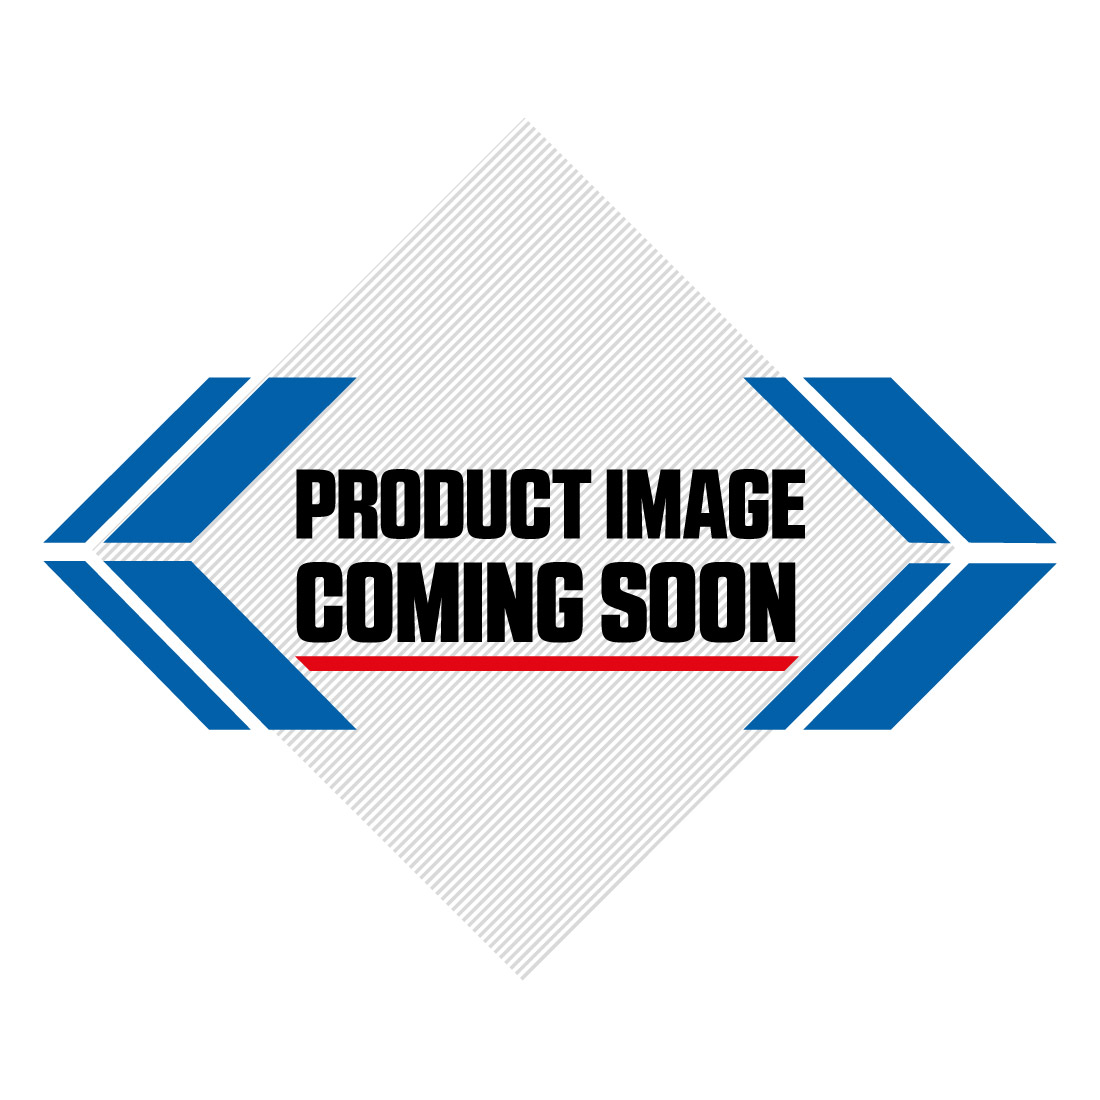 DJI Mavic Pro Fly More Combo 4K Quadcopter Drone Image-0>